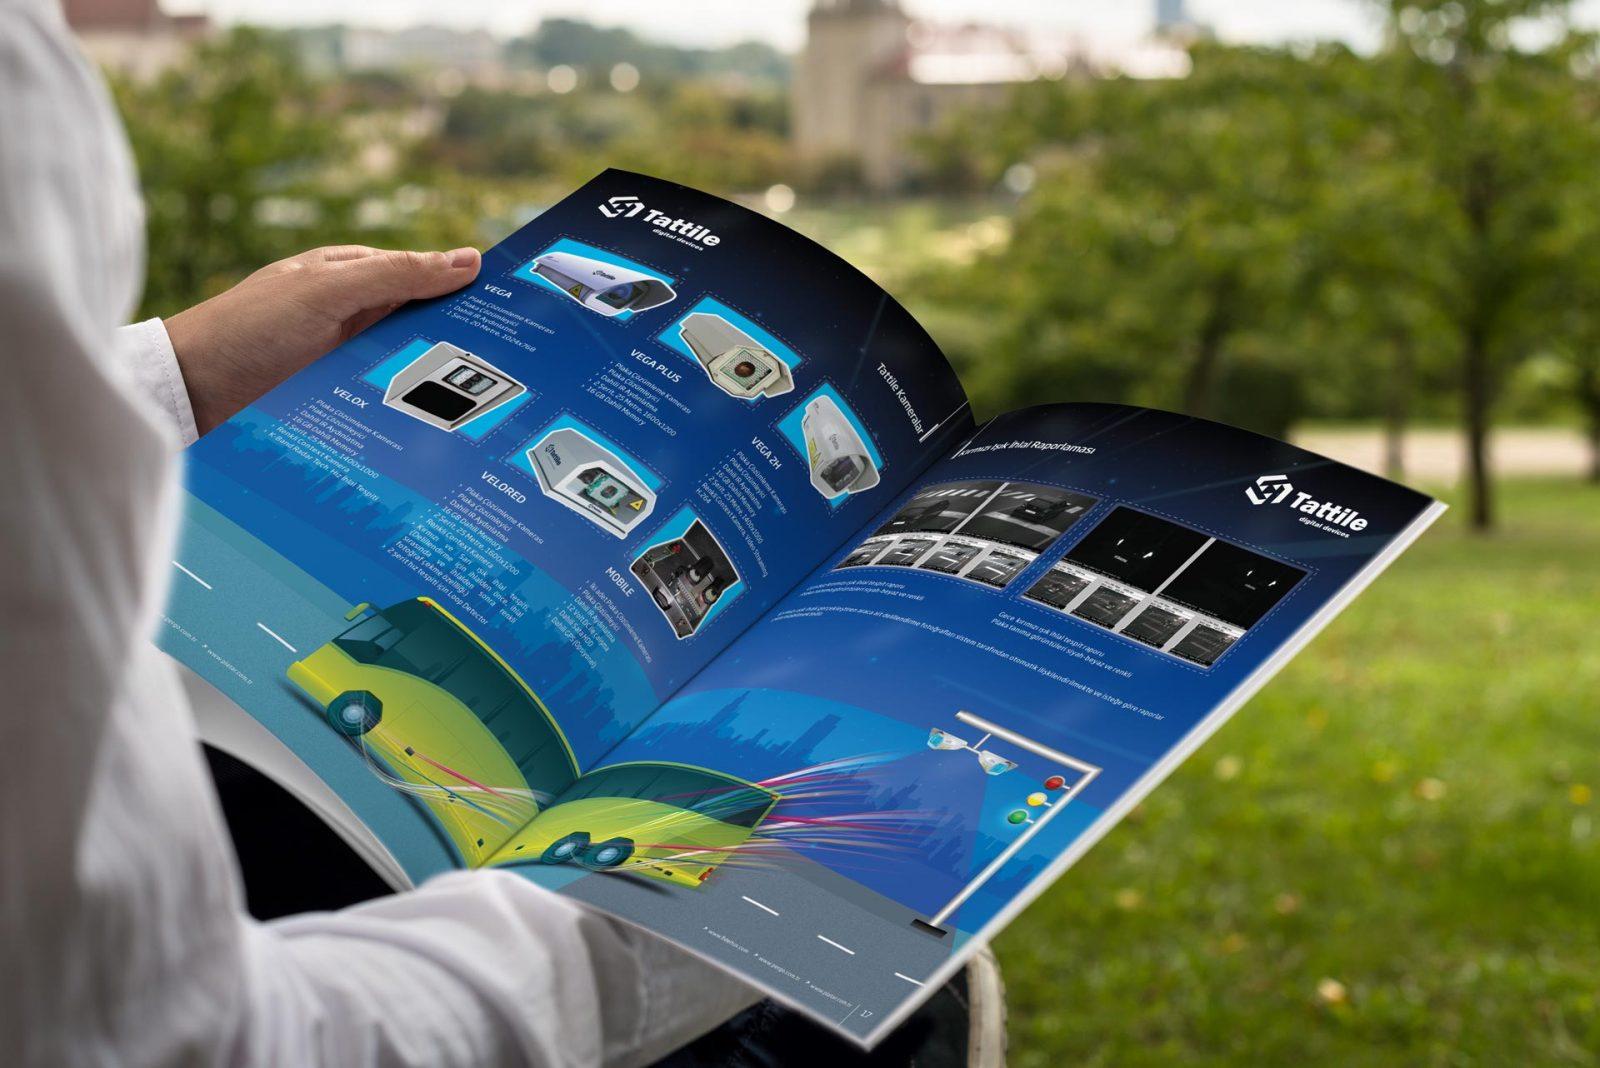 fideltus katalog tasarımı 09